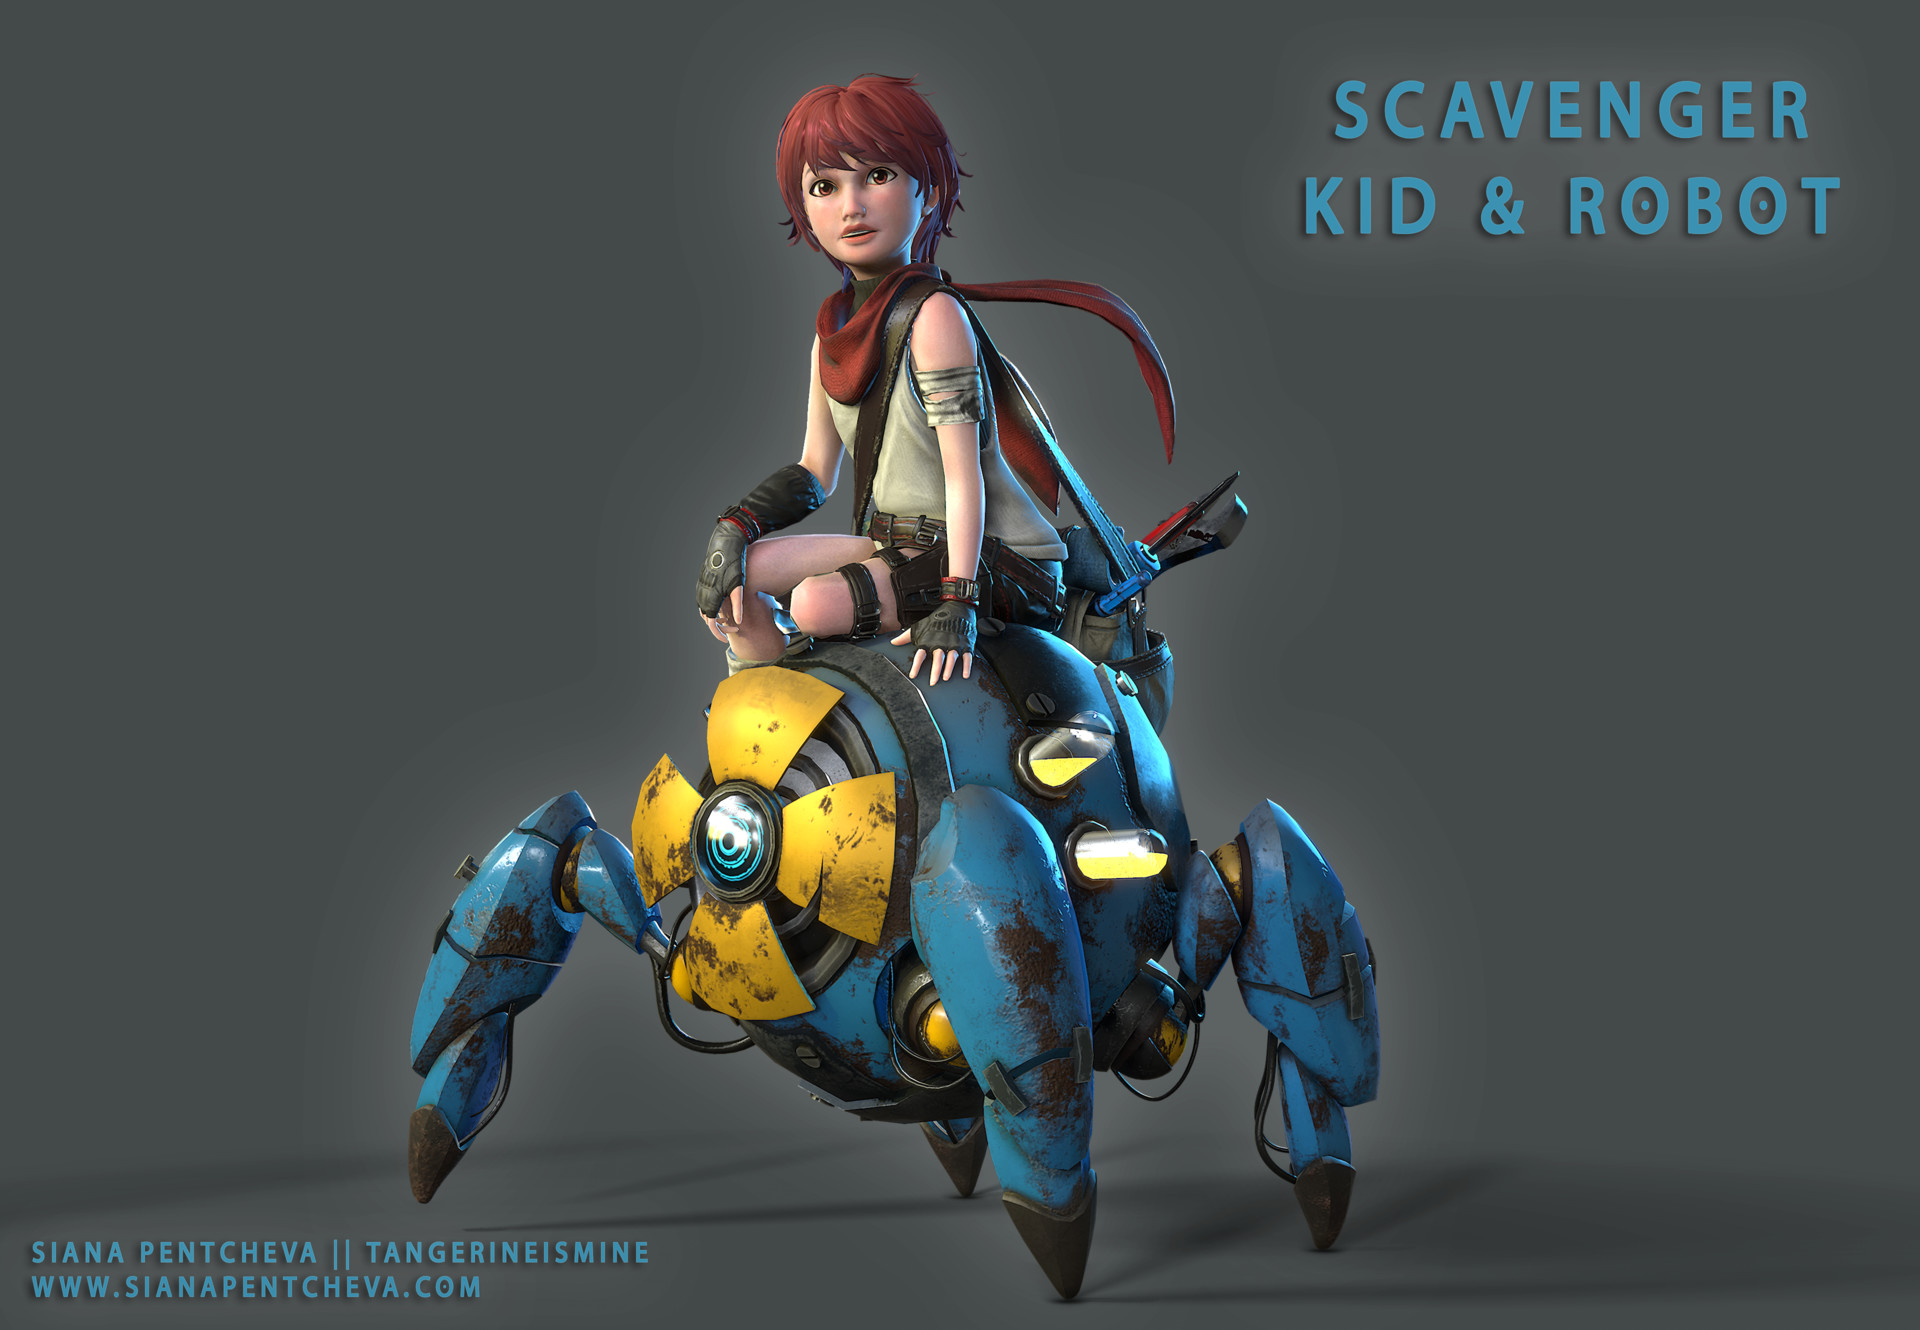 Siana pentcheva scavengerkidandrobot 3